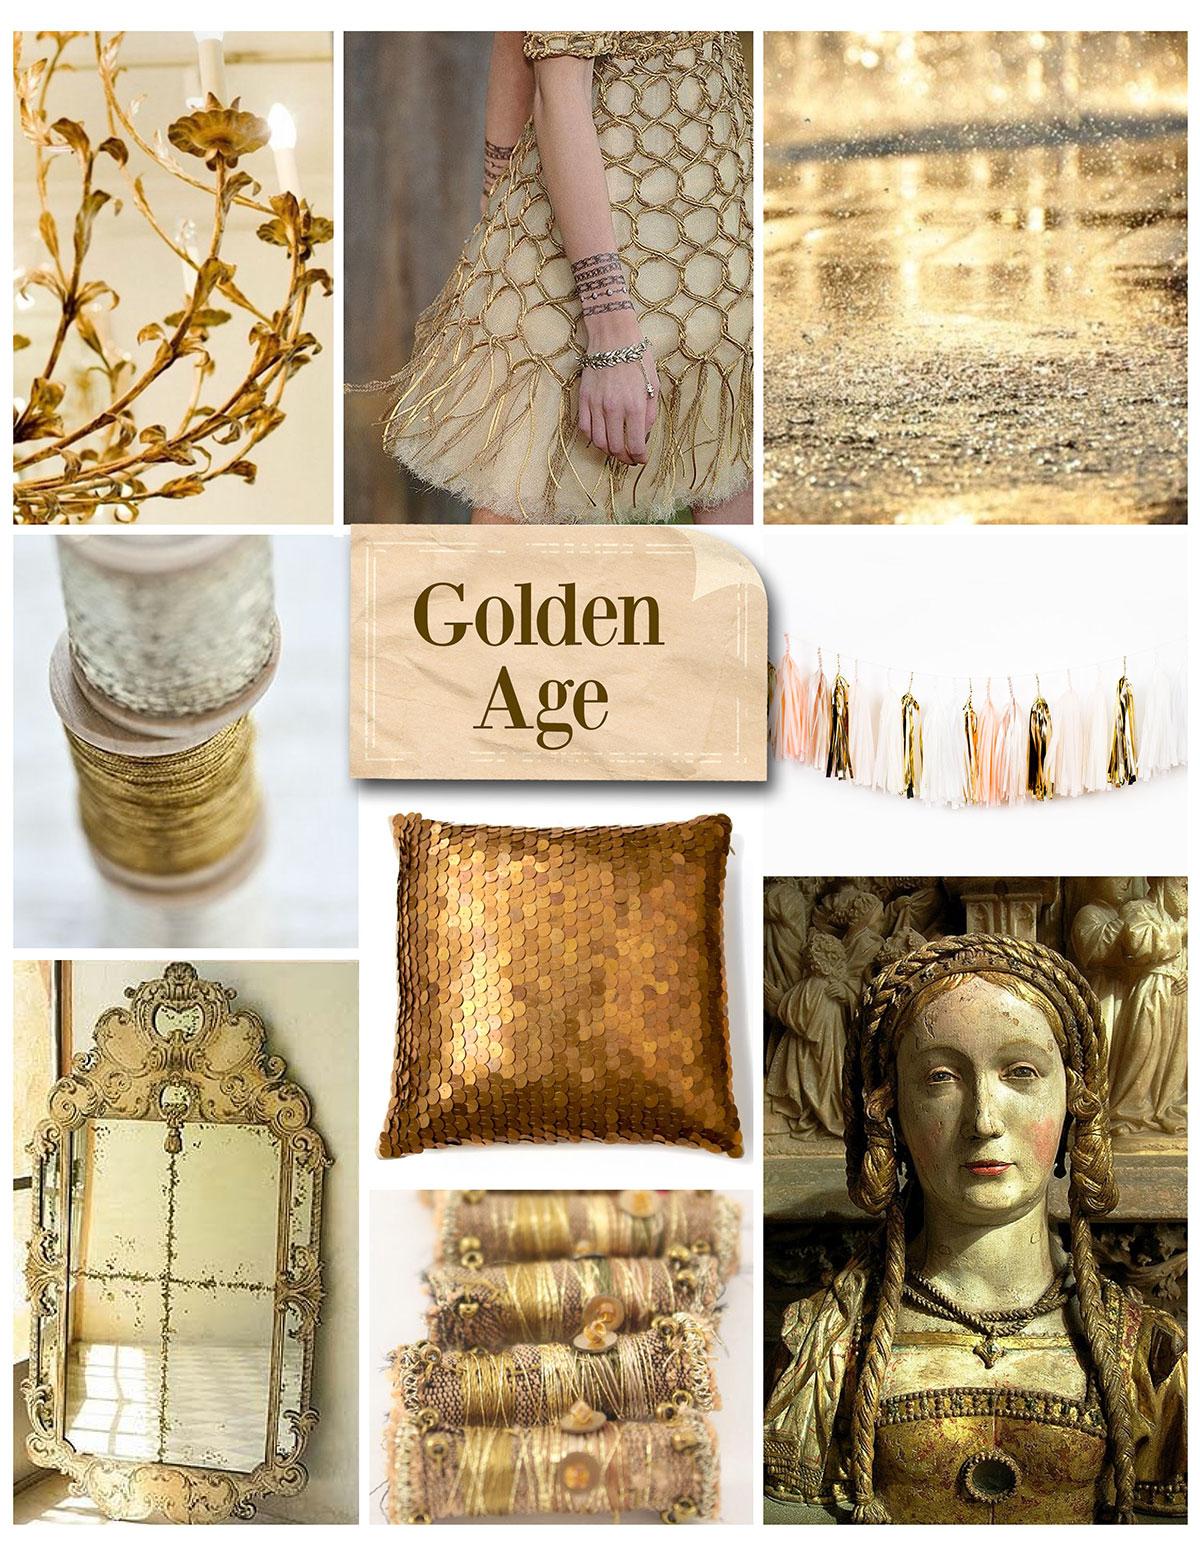 golden-age-2014_02-1